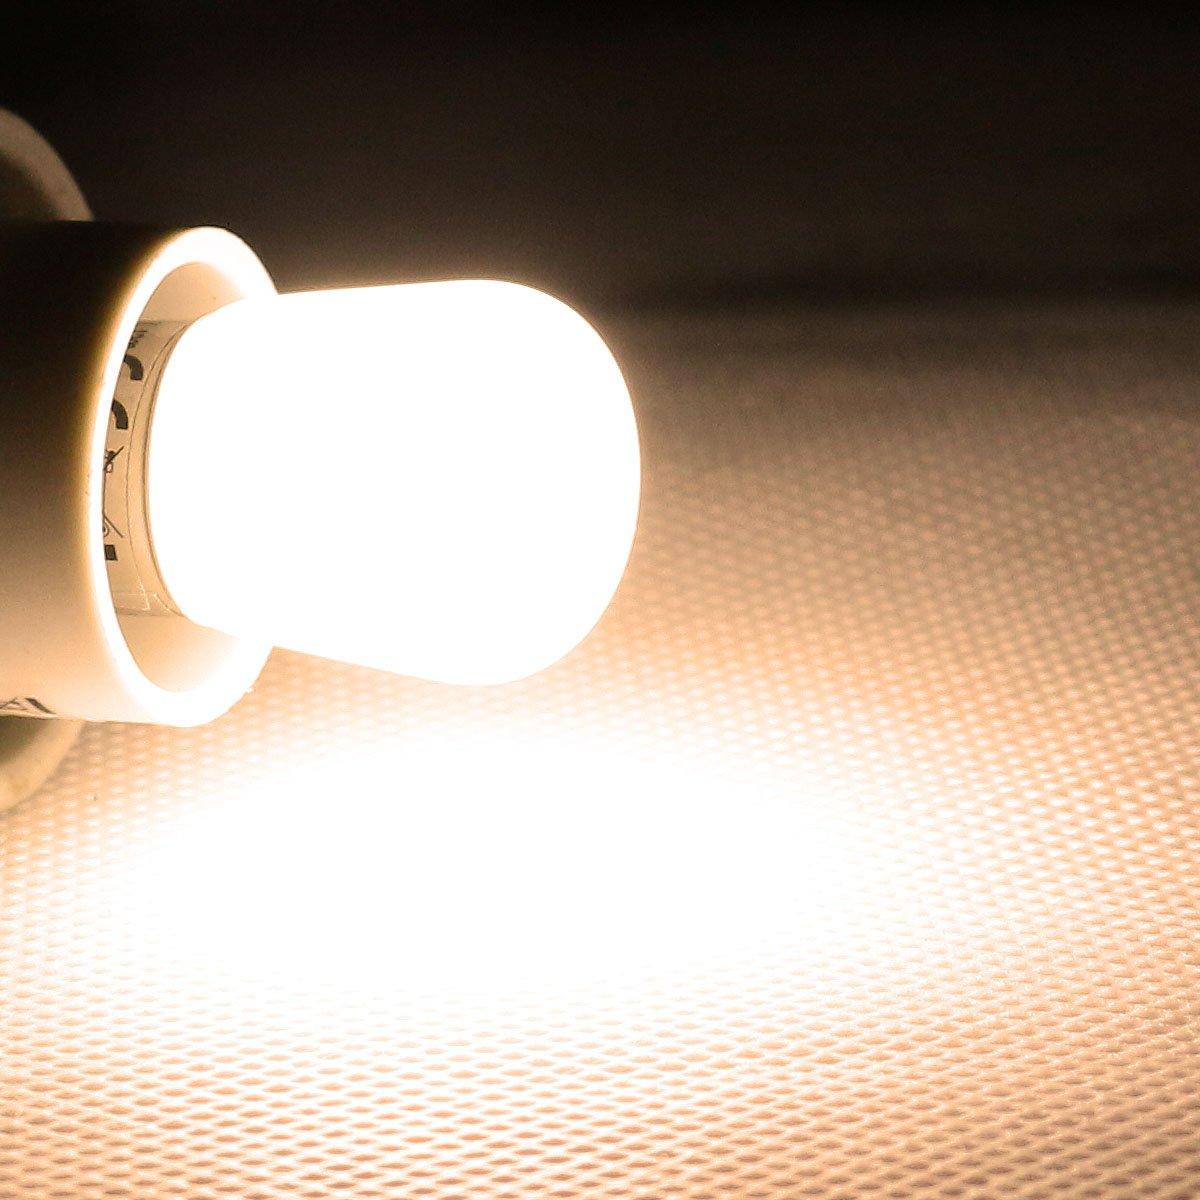 230V 2W 5x E14 LED Lampen MINI warmweiß Leuchtmittel Kühlschrank Birne 140lm